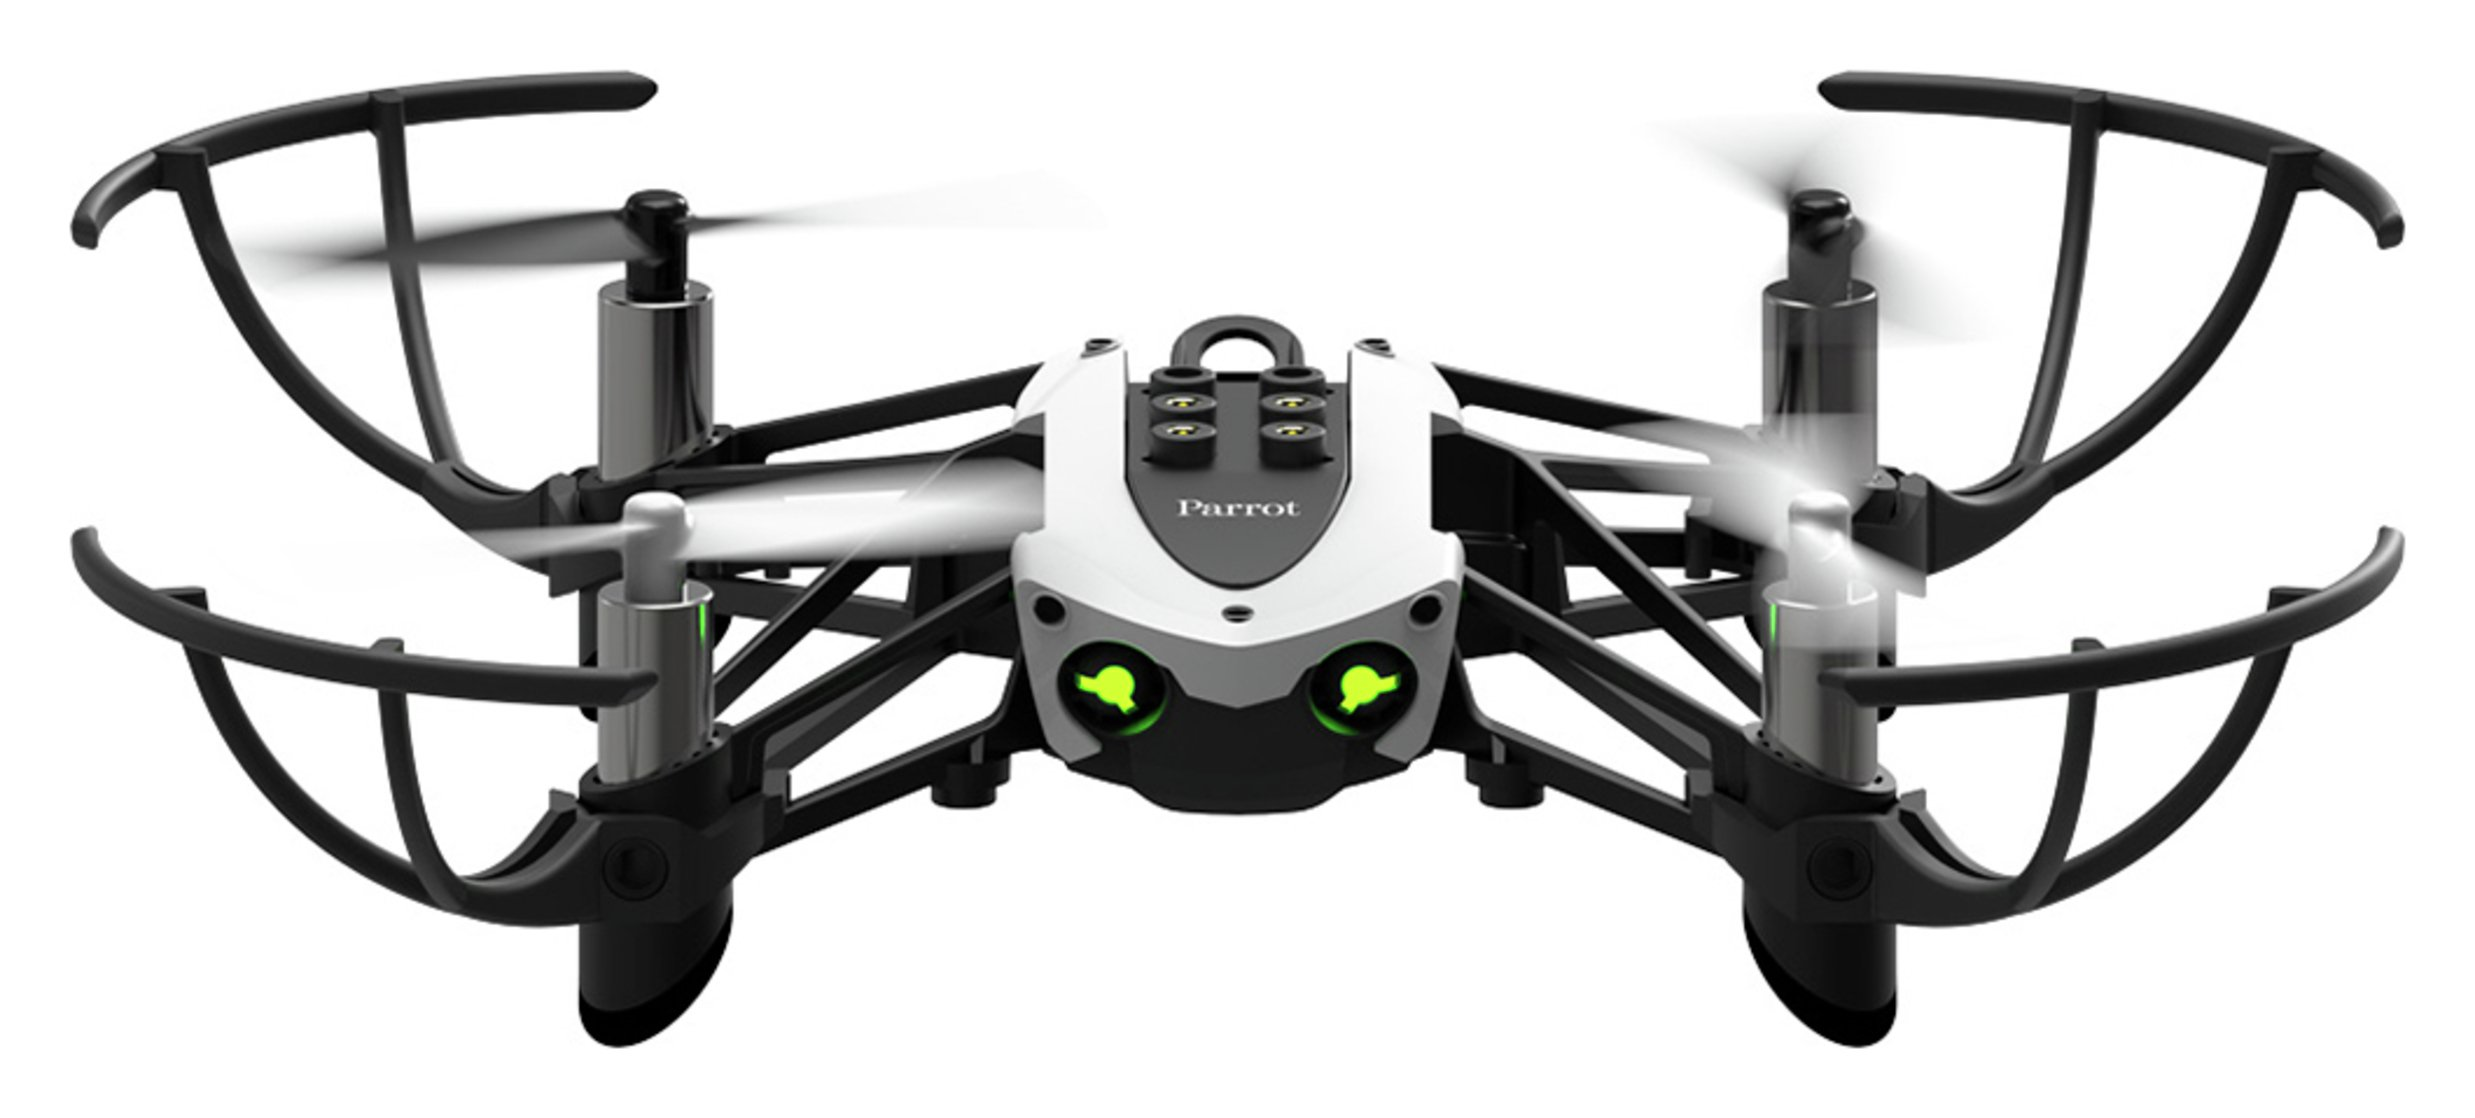 Parrot Mambo Mini Drone.